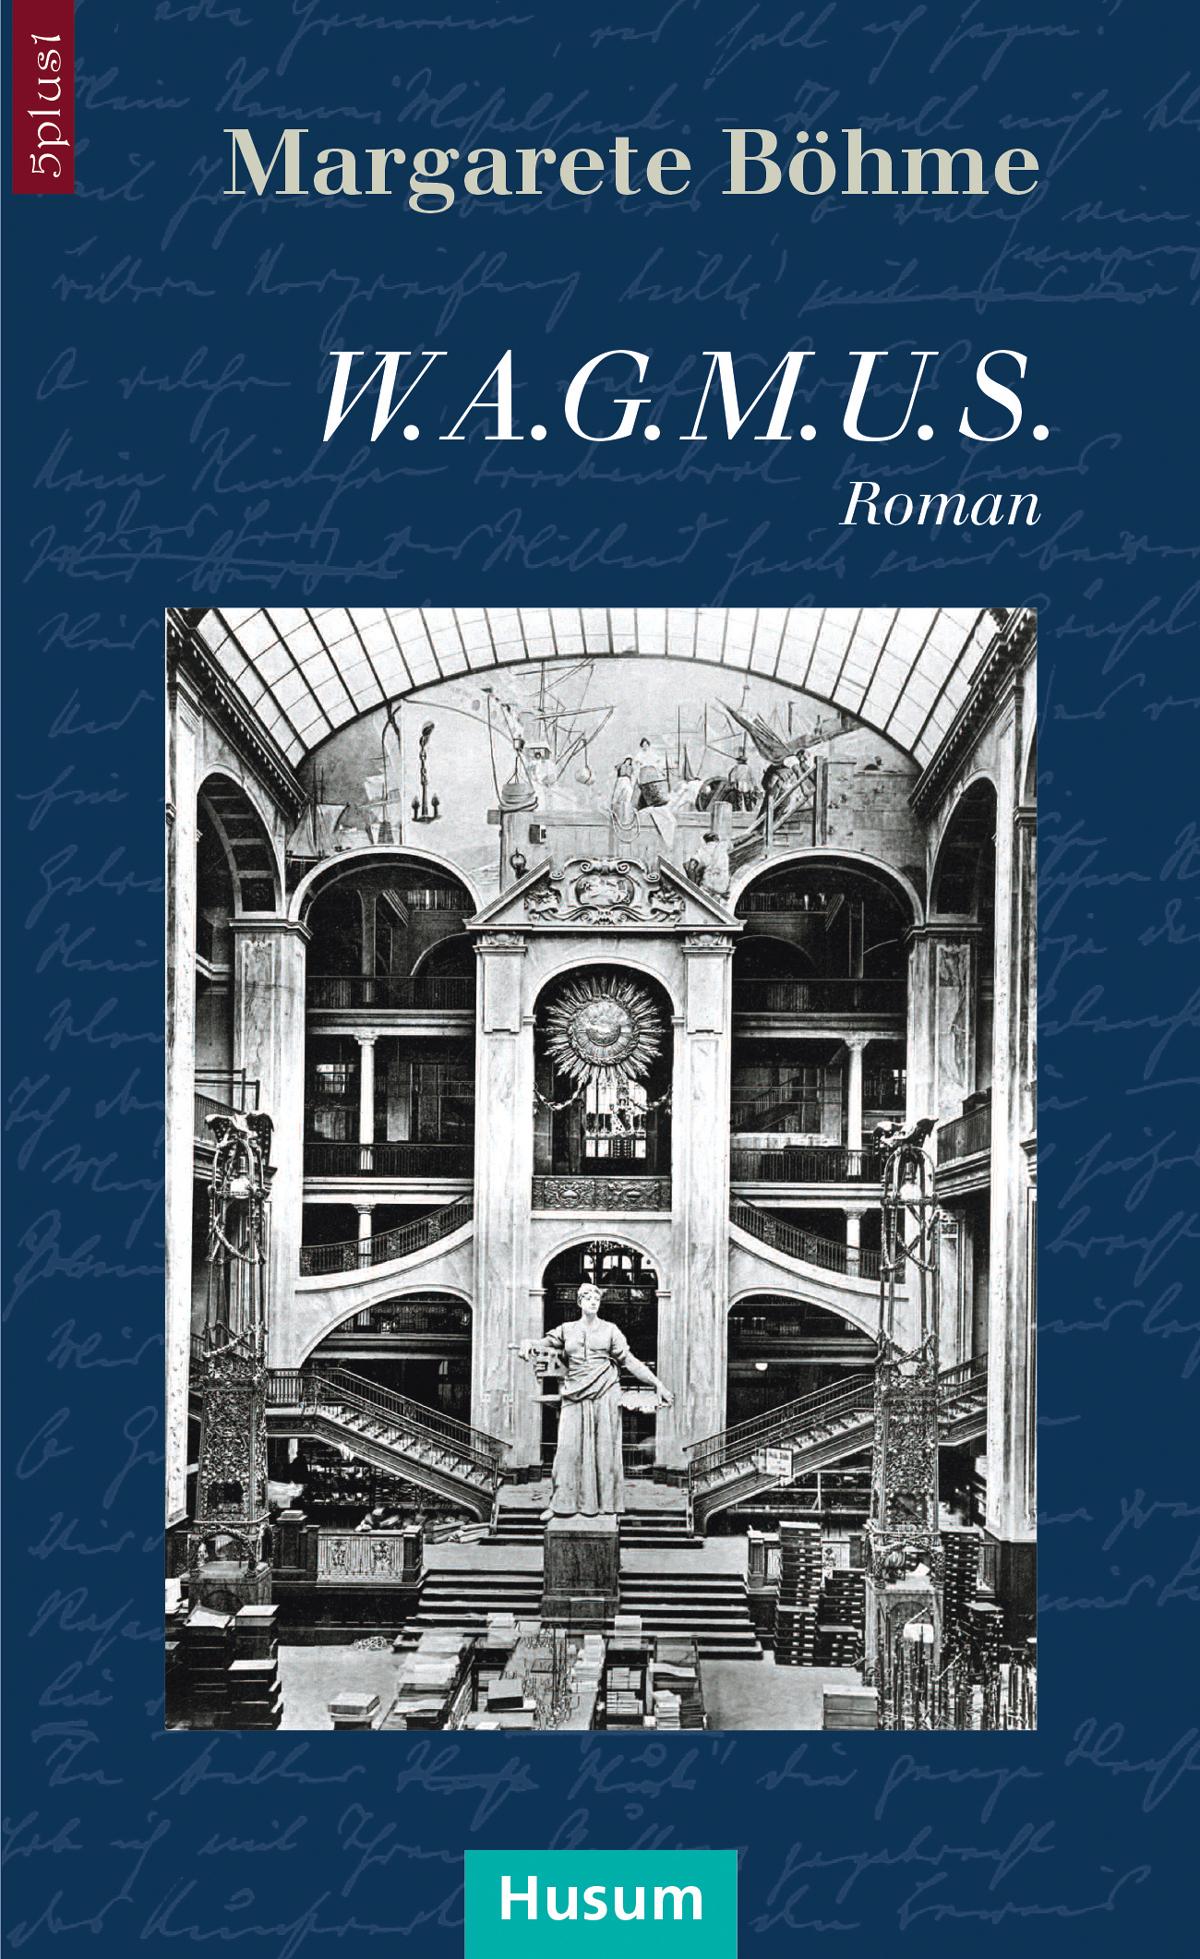 W.A.G.M.U.S. Margarete Böhme